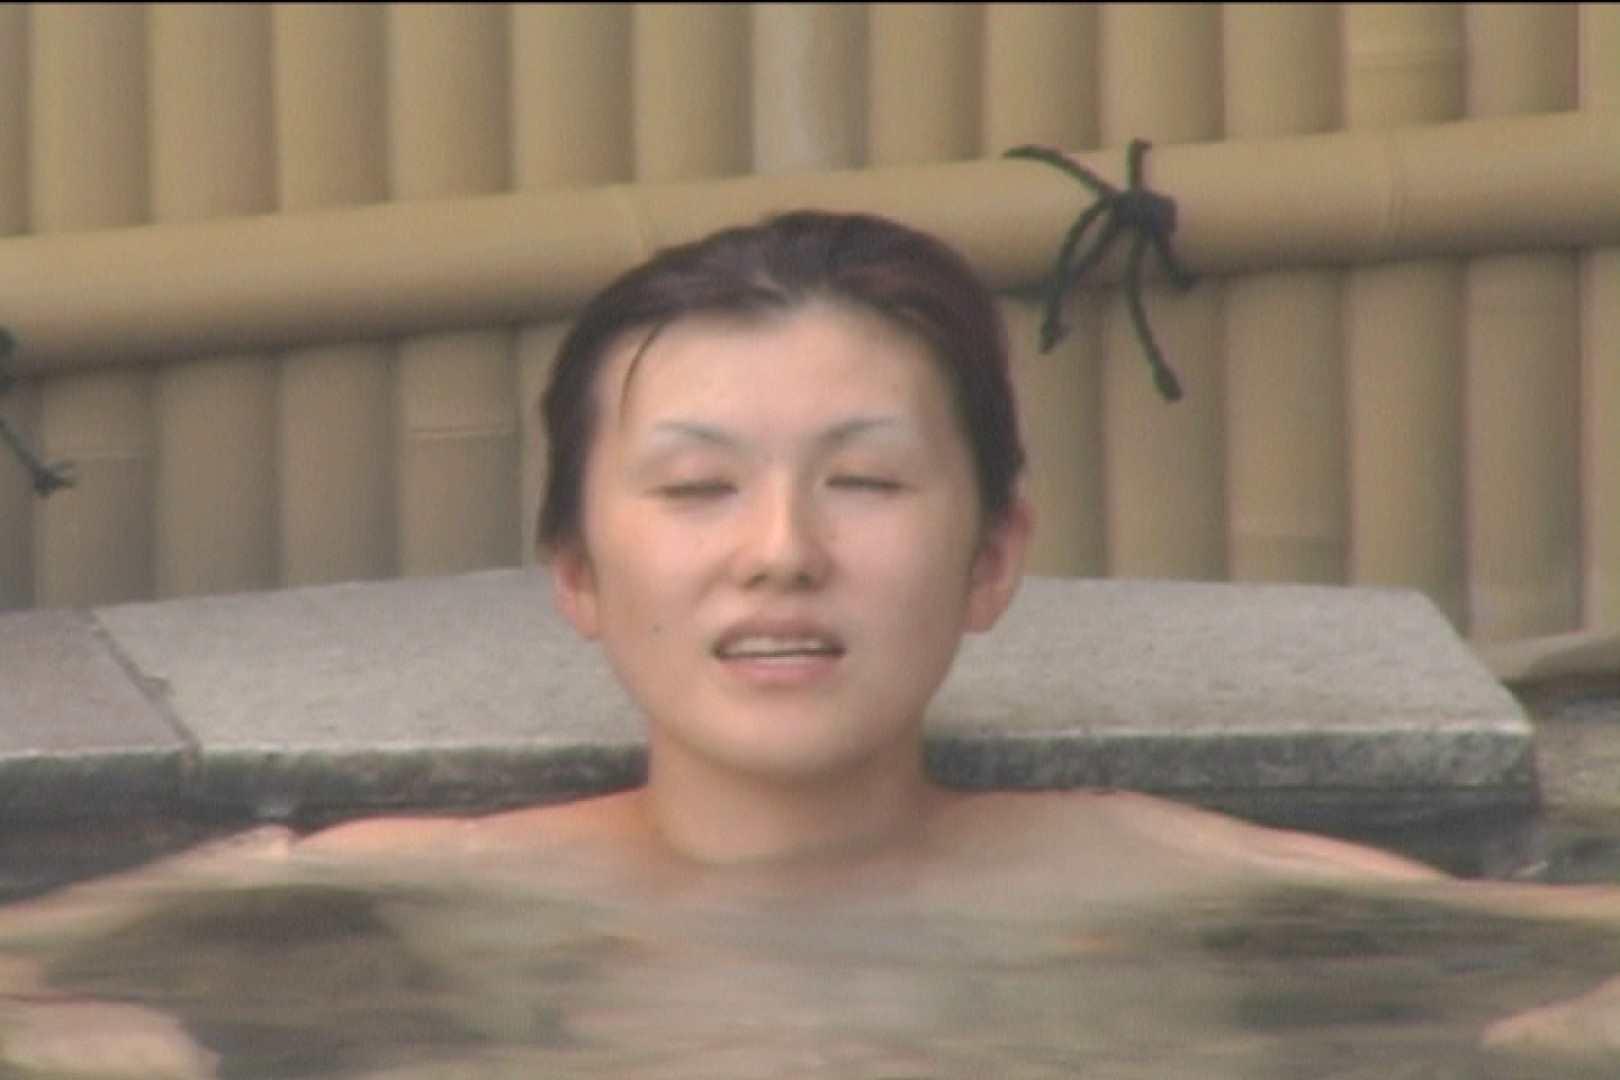 Aquaな露天風呂Vol.532 盗撮 | HなOL  65pic 30